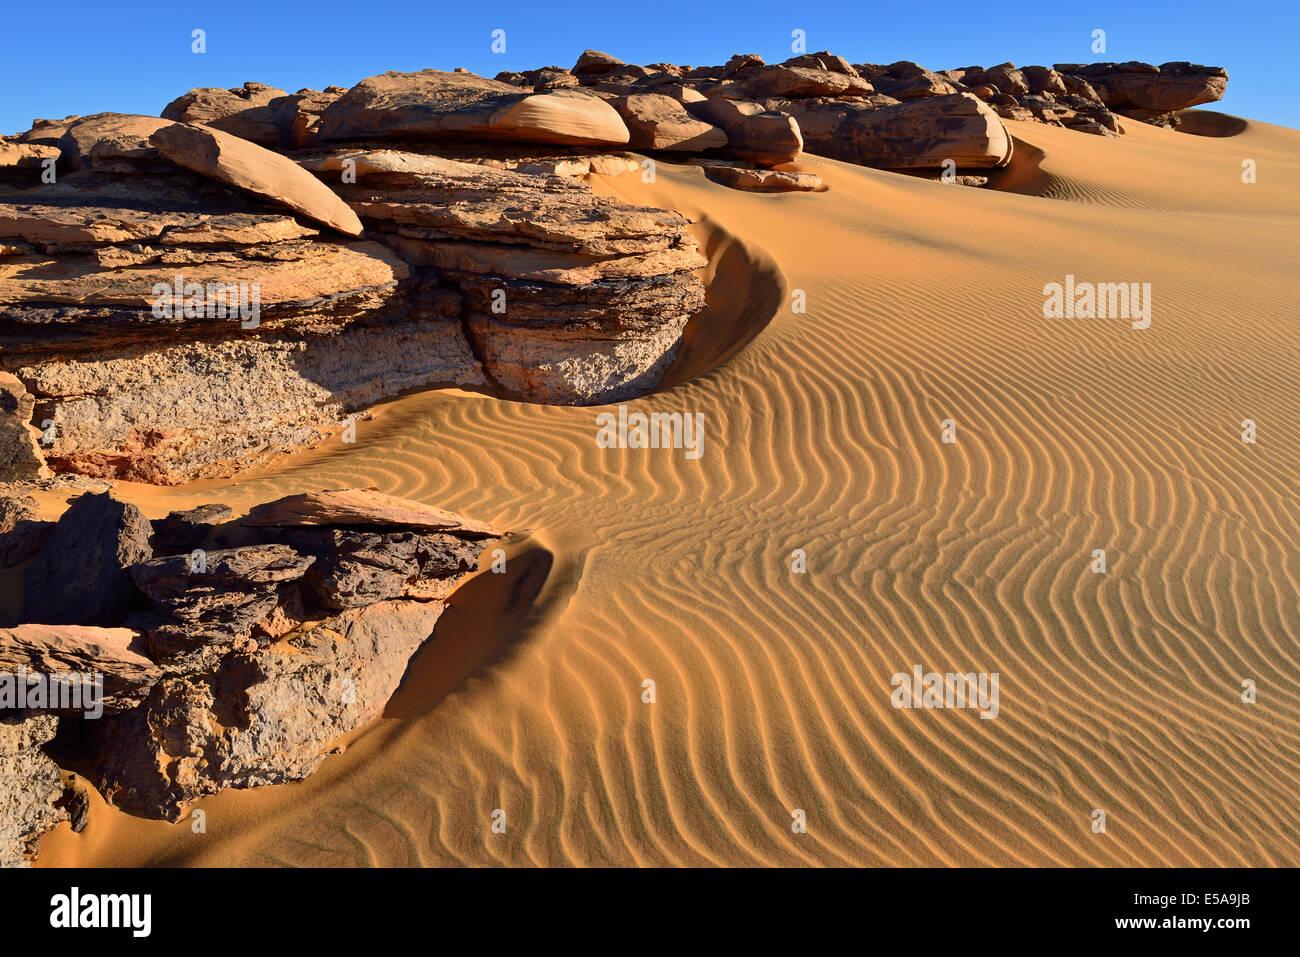 Bicoloured Dunes Noires, sand dunes on Tadrart plateau, Tassili n'Ajjer National Park, Unesco World Heritage Site, Stock Photo